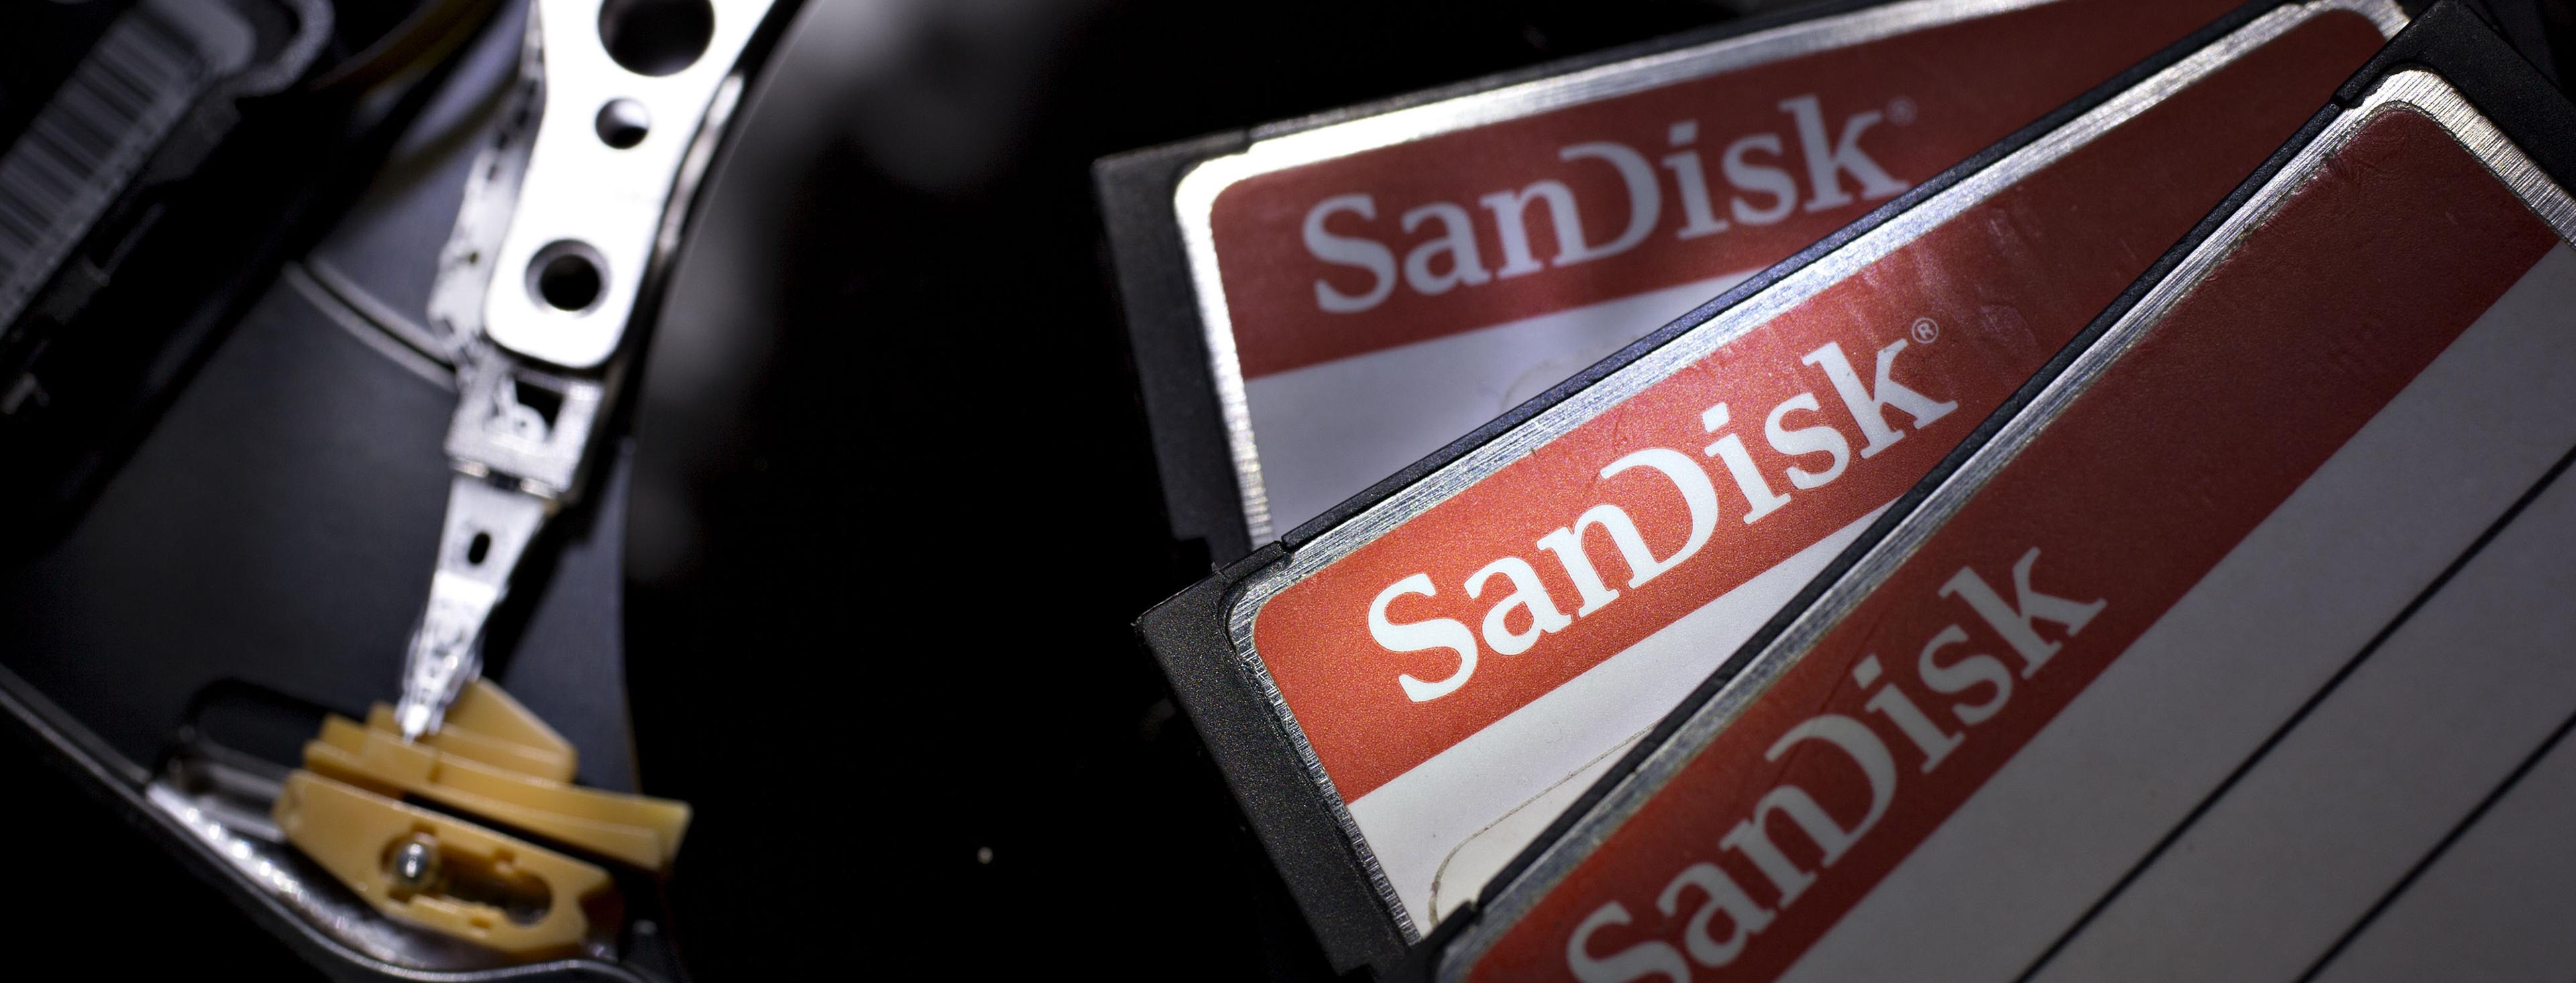 Western Digital Agrees to Buy SanDisk for About $19 Billion